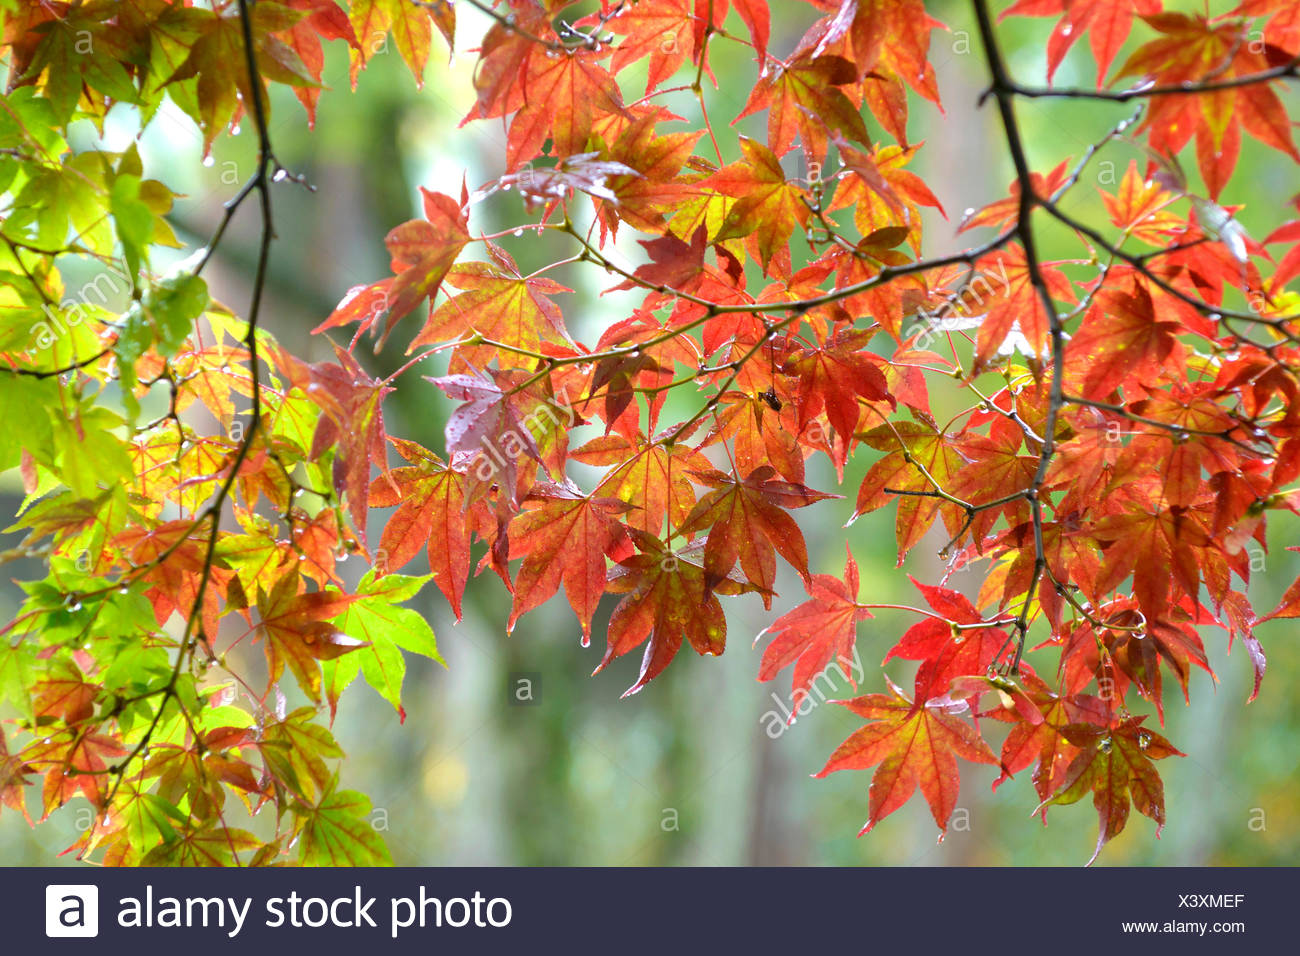 Japanischer Ahorn (Acer Palmatum), Niederlassung in Hintergrundbeleuchtung, Japan Honshu Stockbild